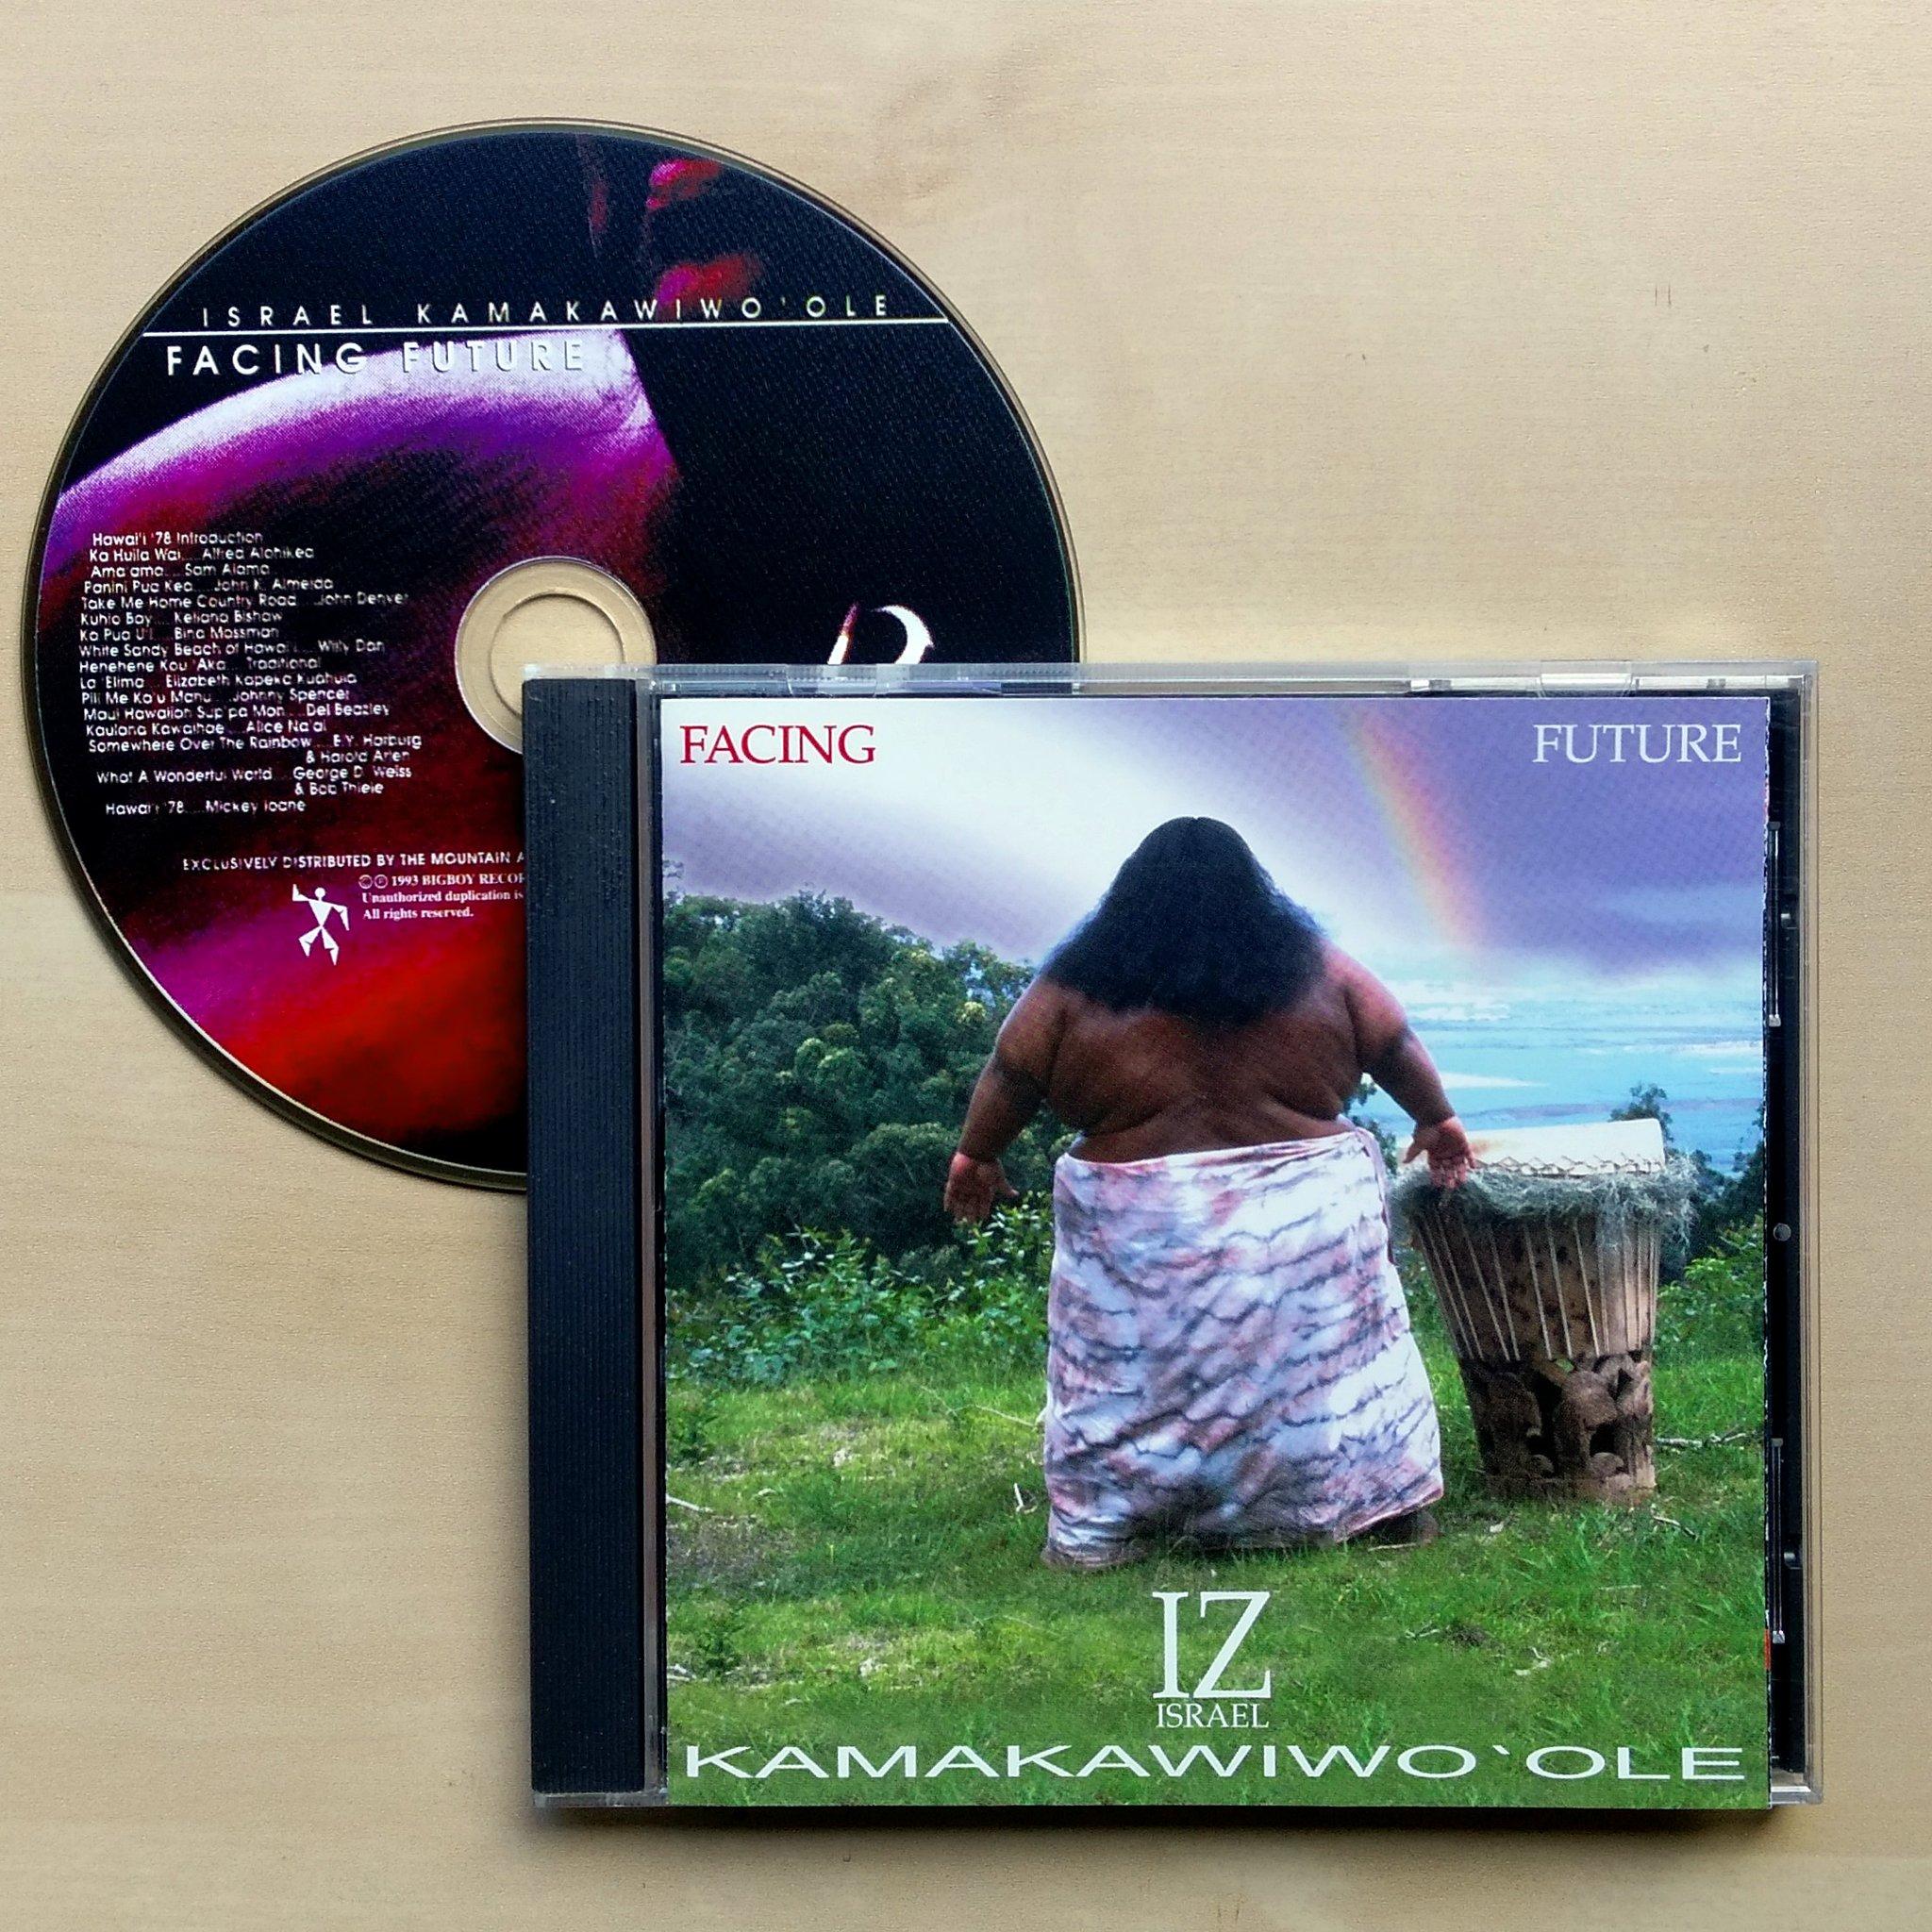 "radiofuturamusic on Twitter: ""Israel Kamakawiwo'ole – Facing Future.  Original 1993 CD headed out to Tijeras, New Mexico. #IsraelKamakawiwoole #IZ  #FacingFuture #SomewhereOverTheRainbow #RockMusic #ReggaeMusic  #HawaiianMusic #CDCollector ..."